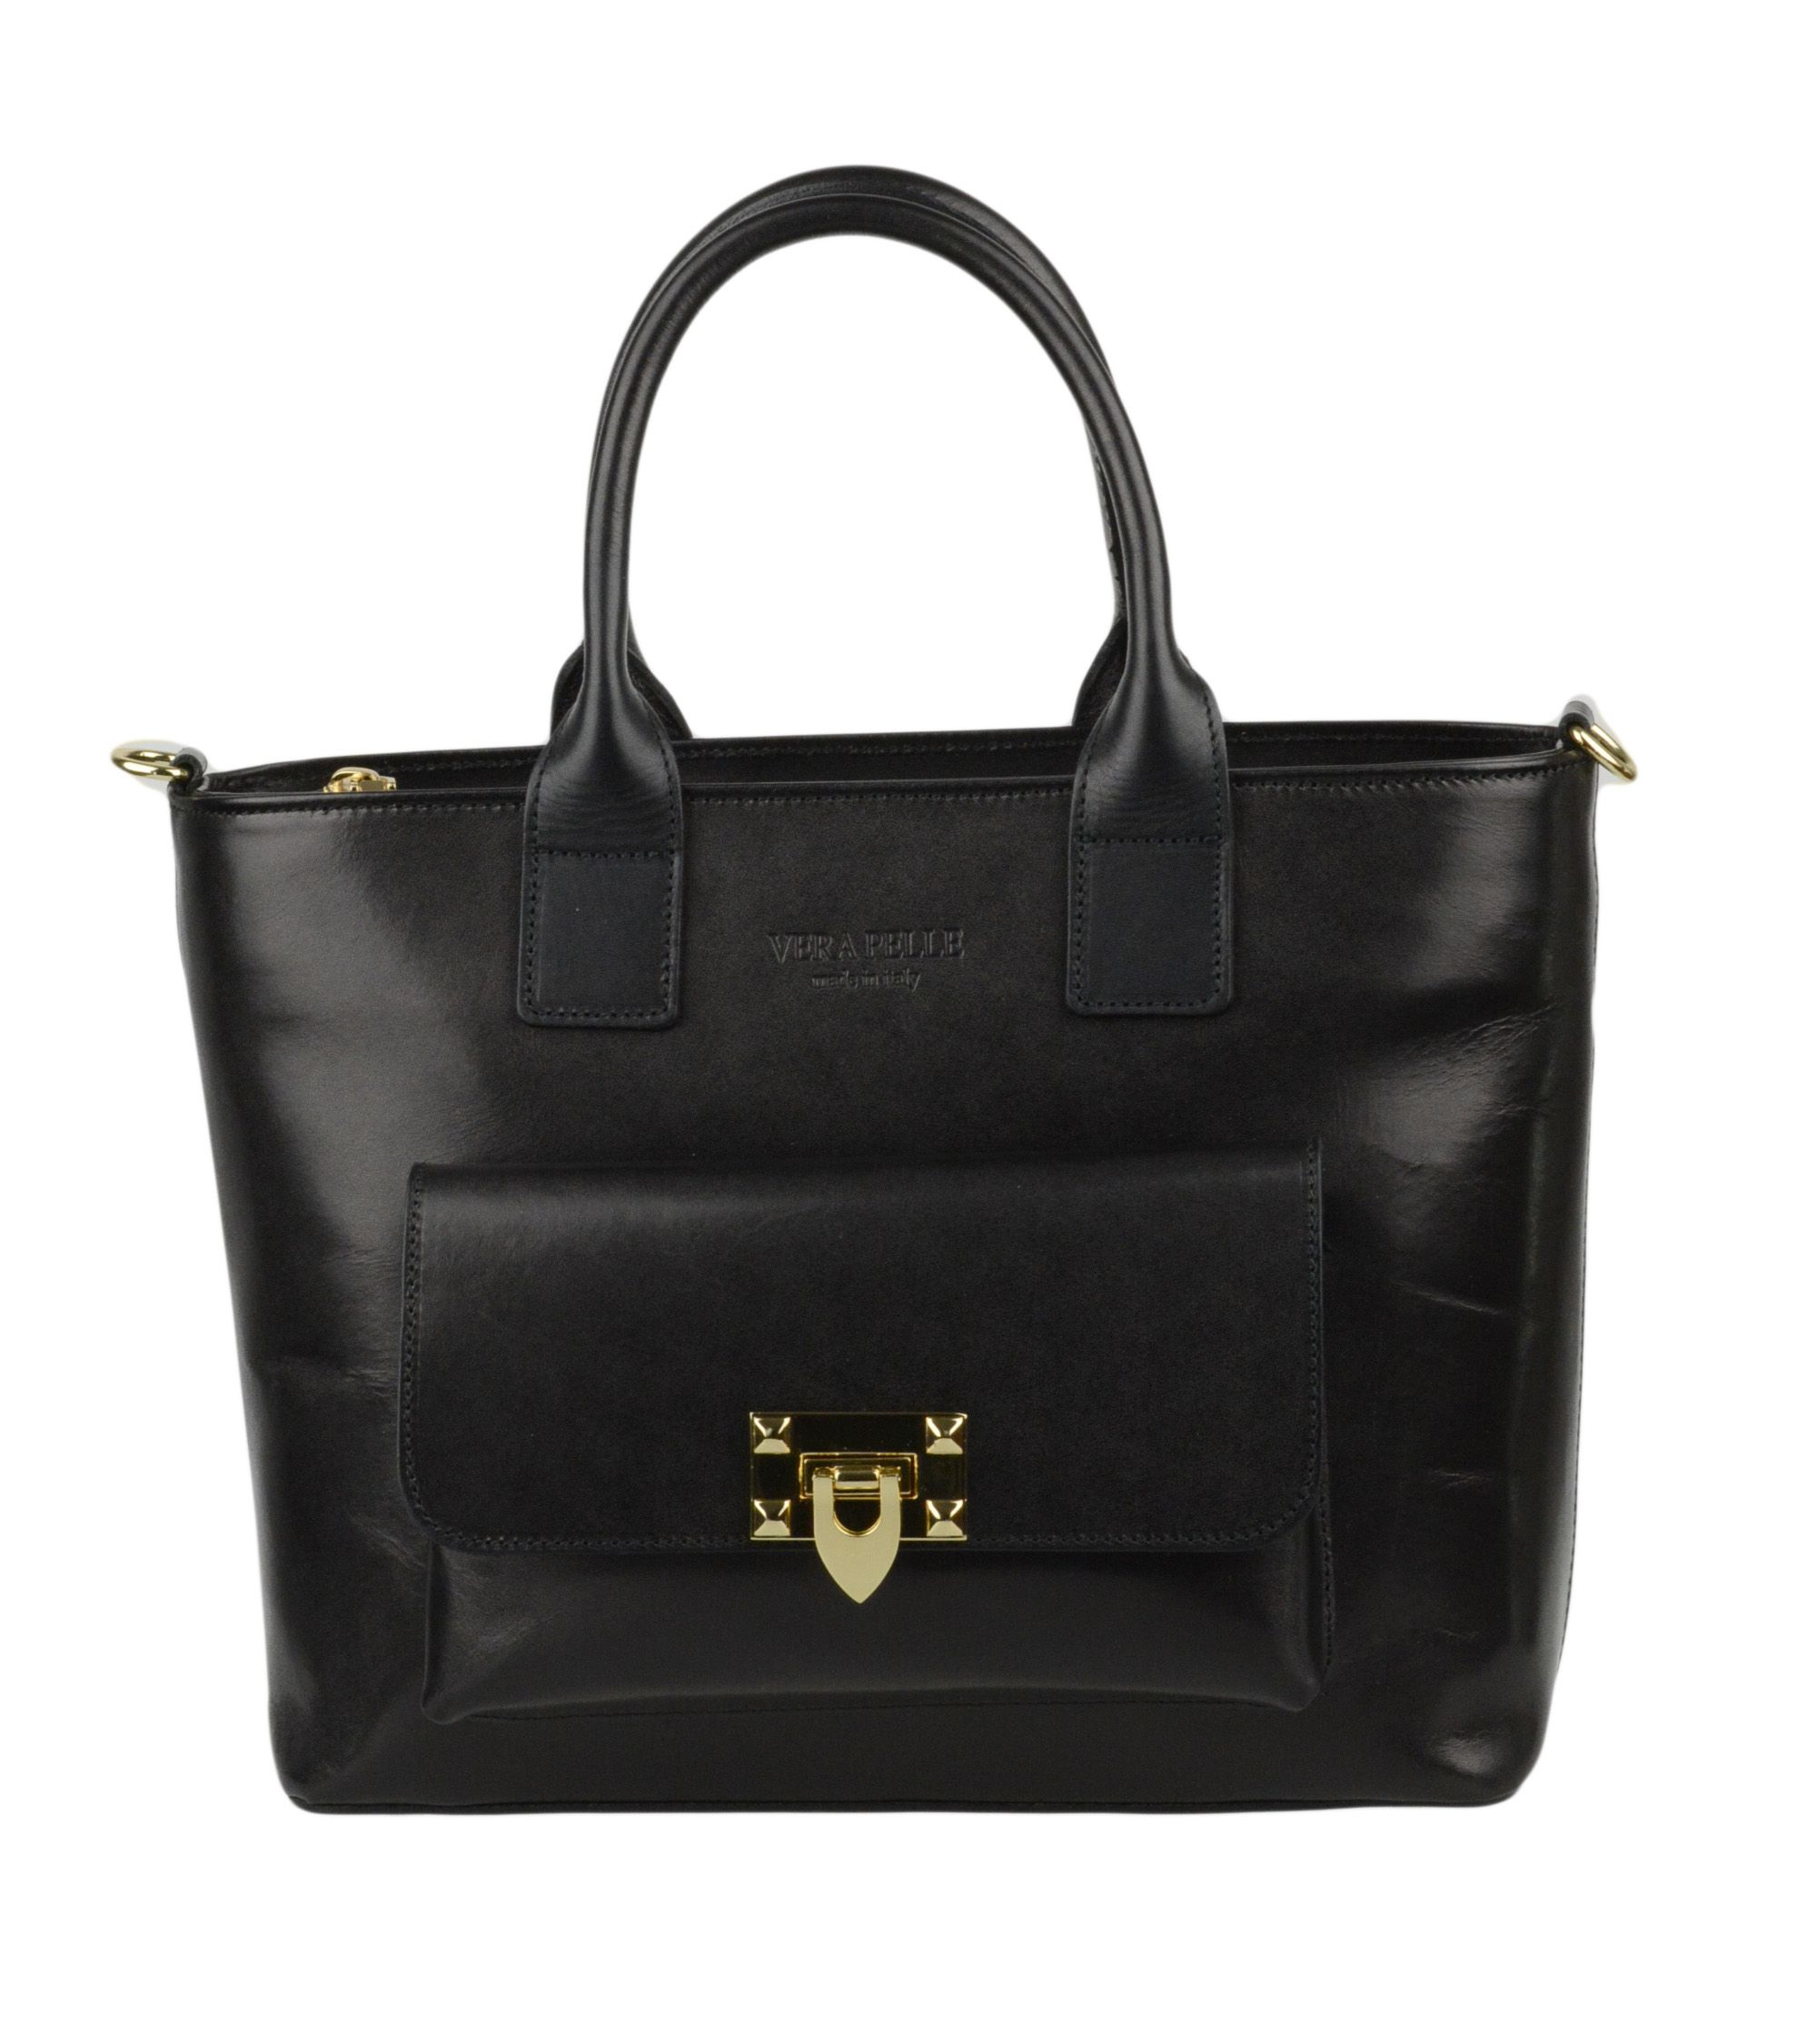 Vera Pelle Torebka Wloska Skora Kuferek 14892 7205708361 Oficjalne Archiwum Allegro Bags Top Handle Bag Fashion